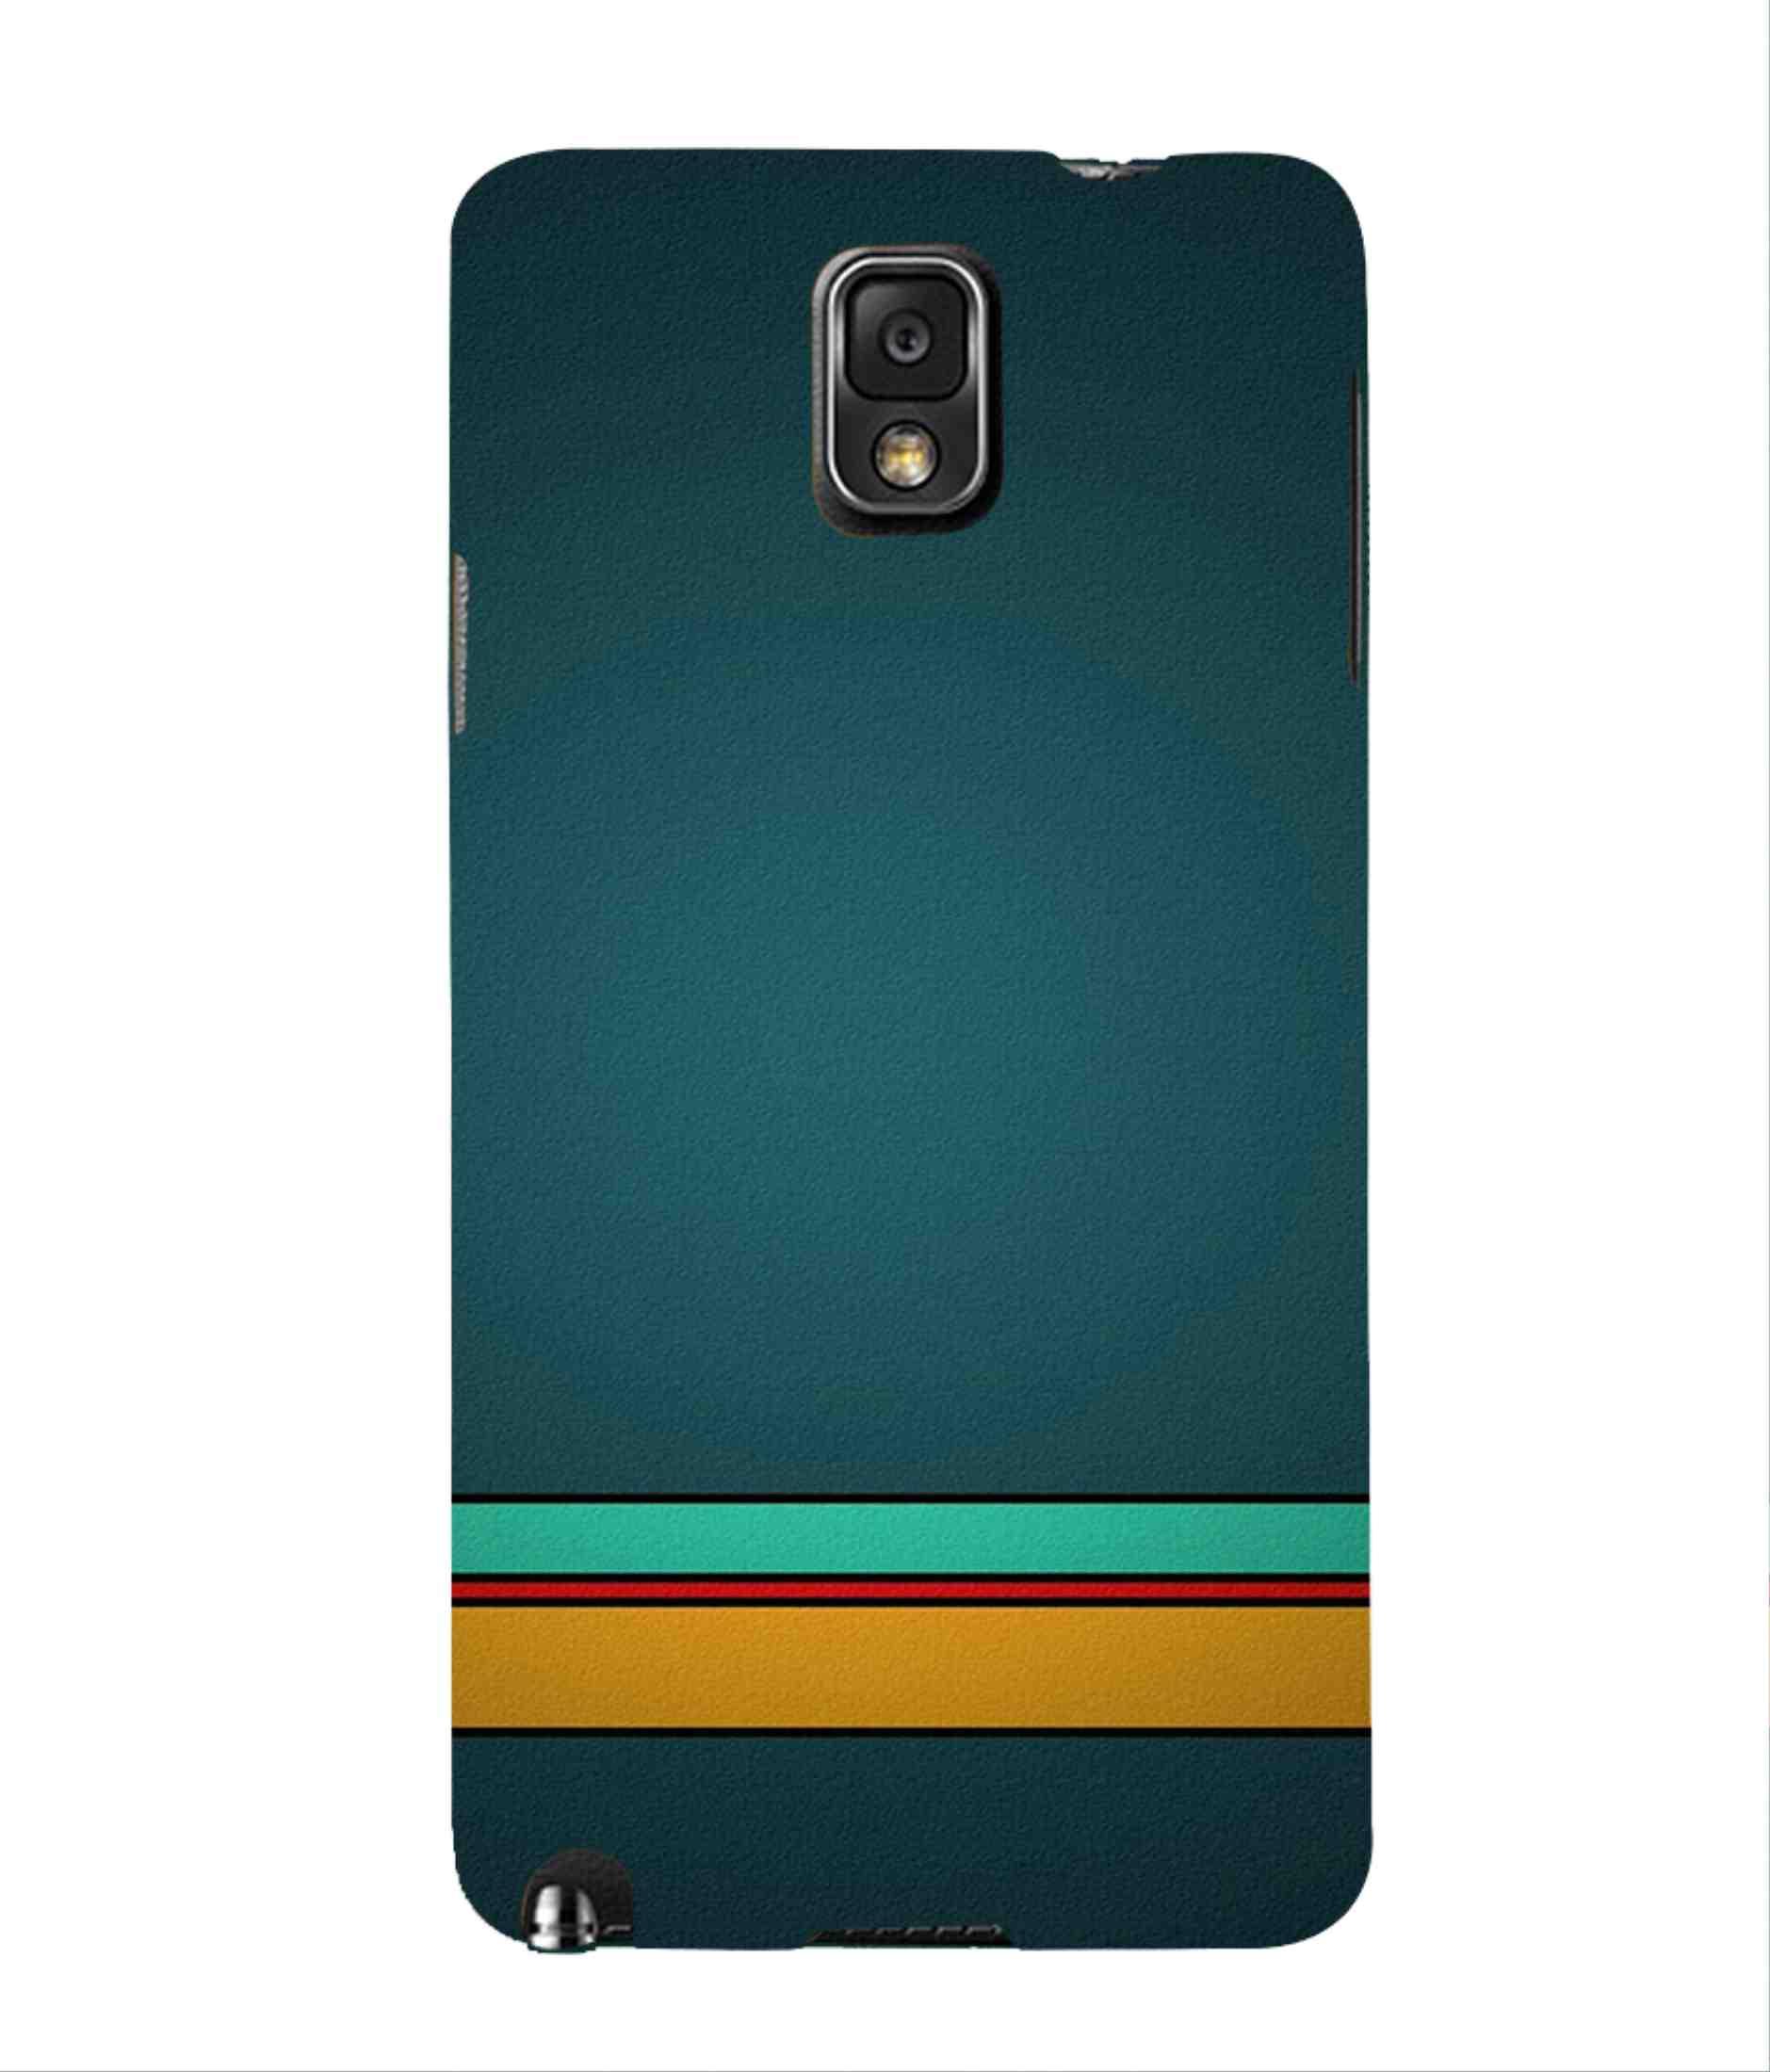 Vibrante Mobile Case Cover For Samsung Galaxy Note 3 , Samsung Galaxy Note Iii , Samsung Galaxy Note 3 N9002 , Samsung Galaxy Note N9000 N9005 28861